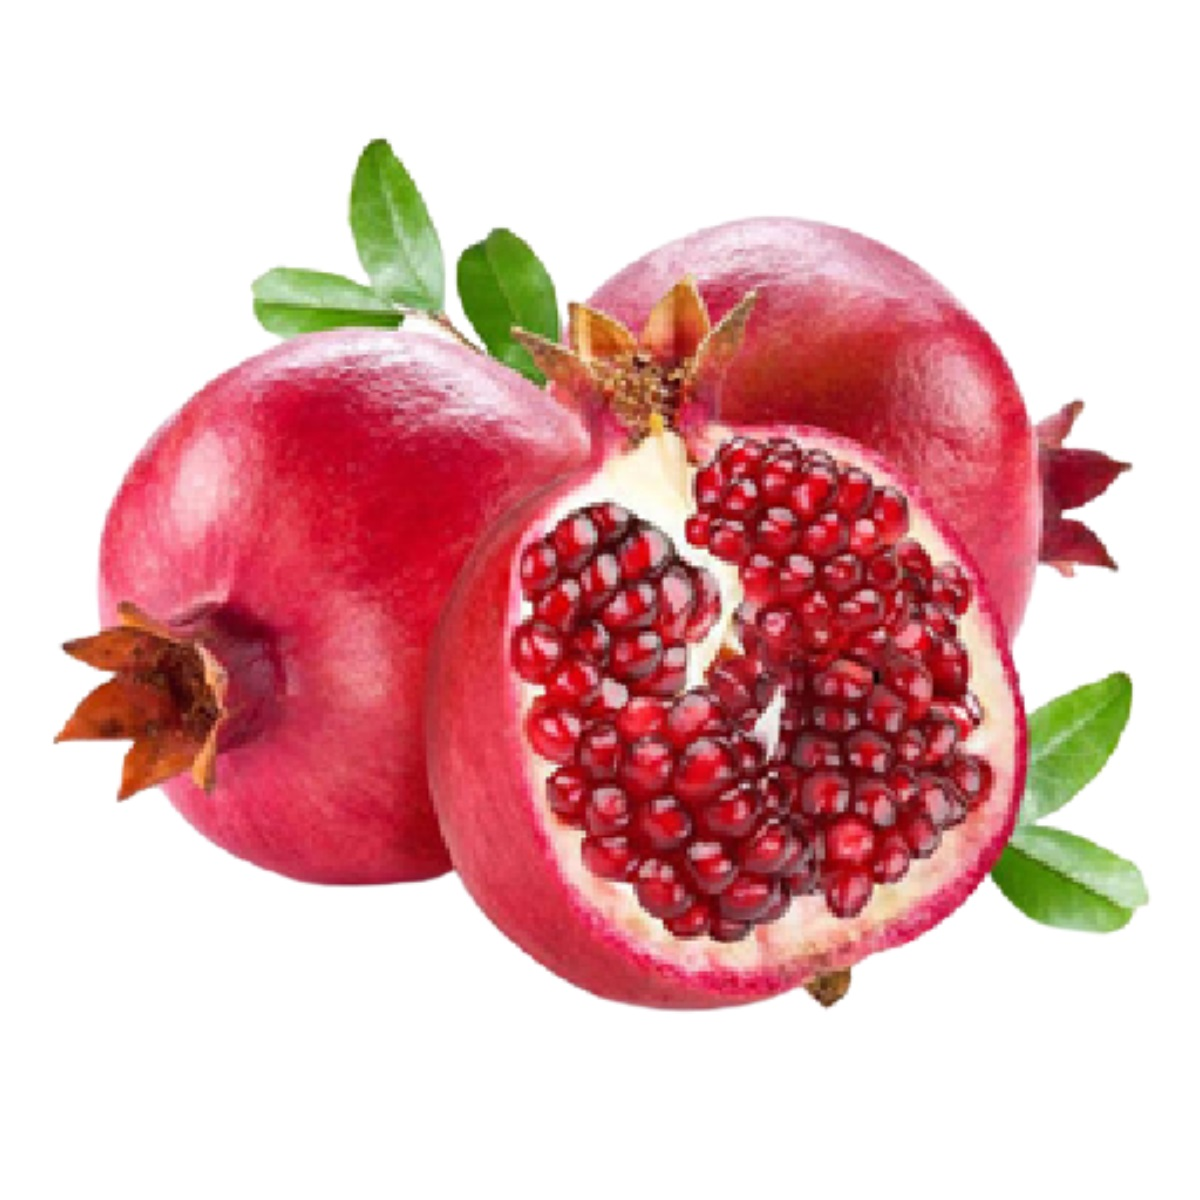 dalim (pomegranate) 500gm